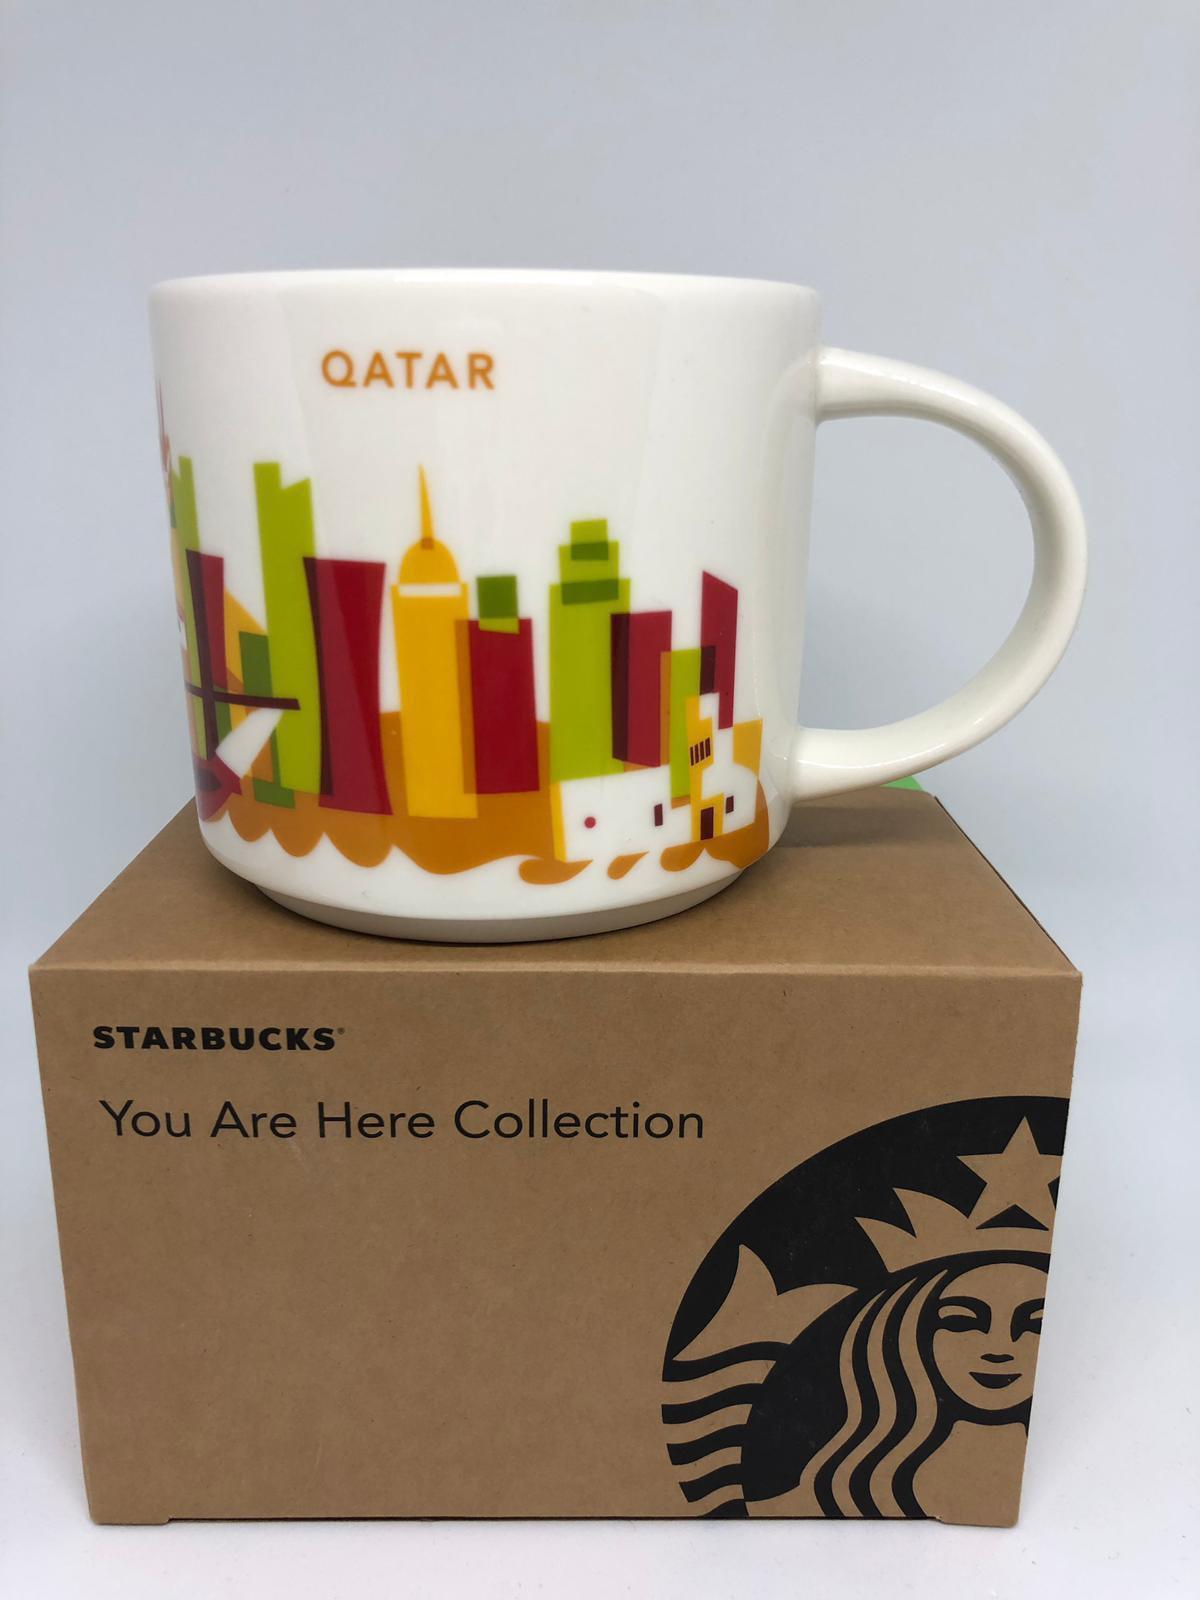 Starbucks You Are Here Collection Qatar Ceramic Coffee Mug New With Box Walmart Com Walmart Com